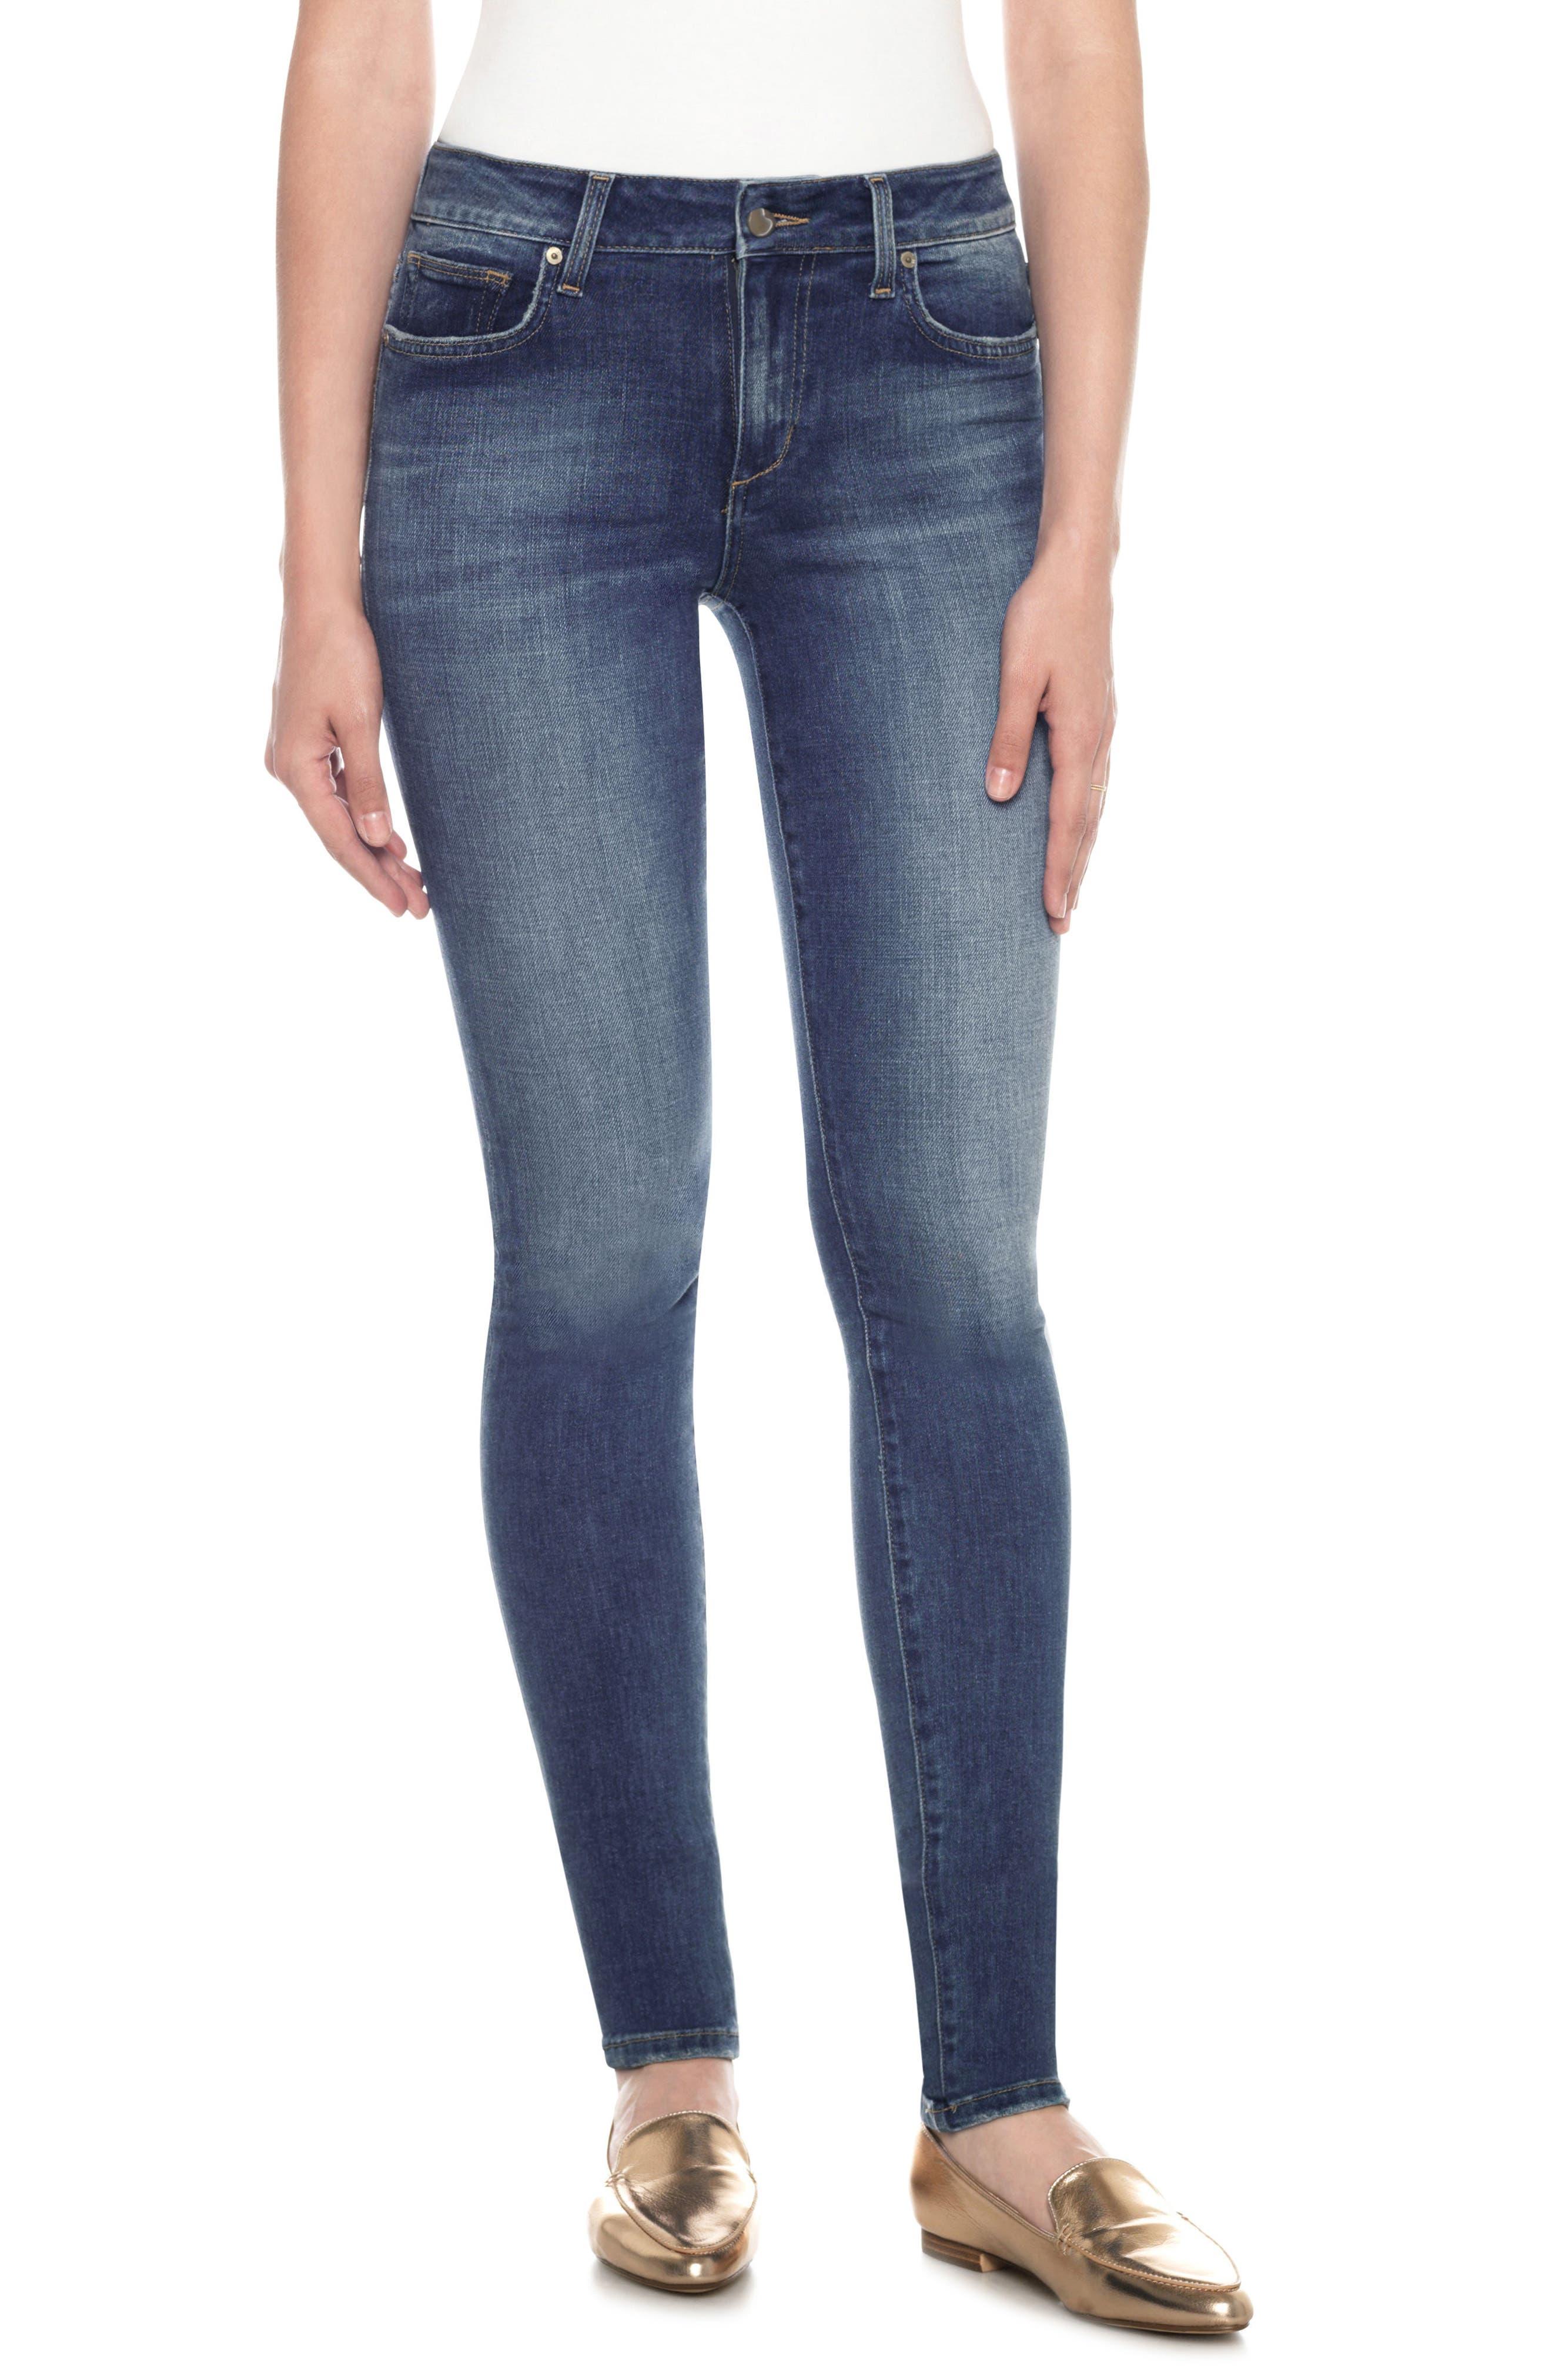 Alternate Image 1 Selected - Joe's Twiggy Skinny Jeans (Kinney)